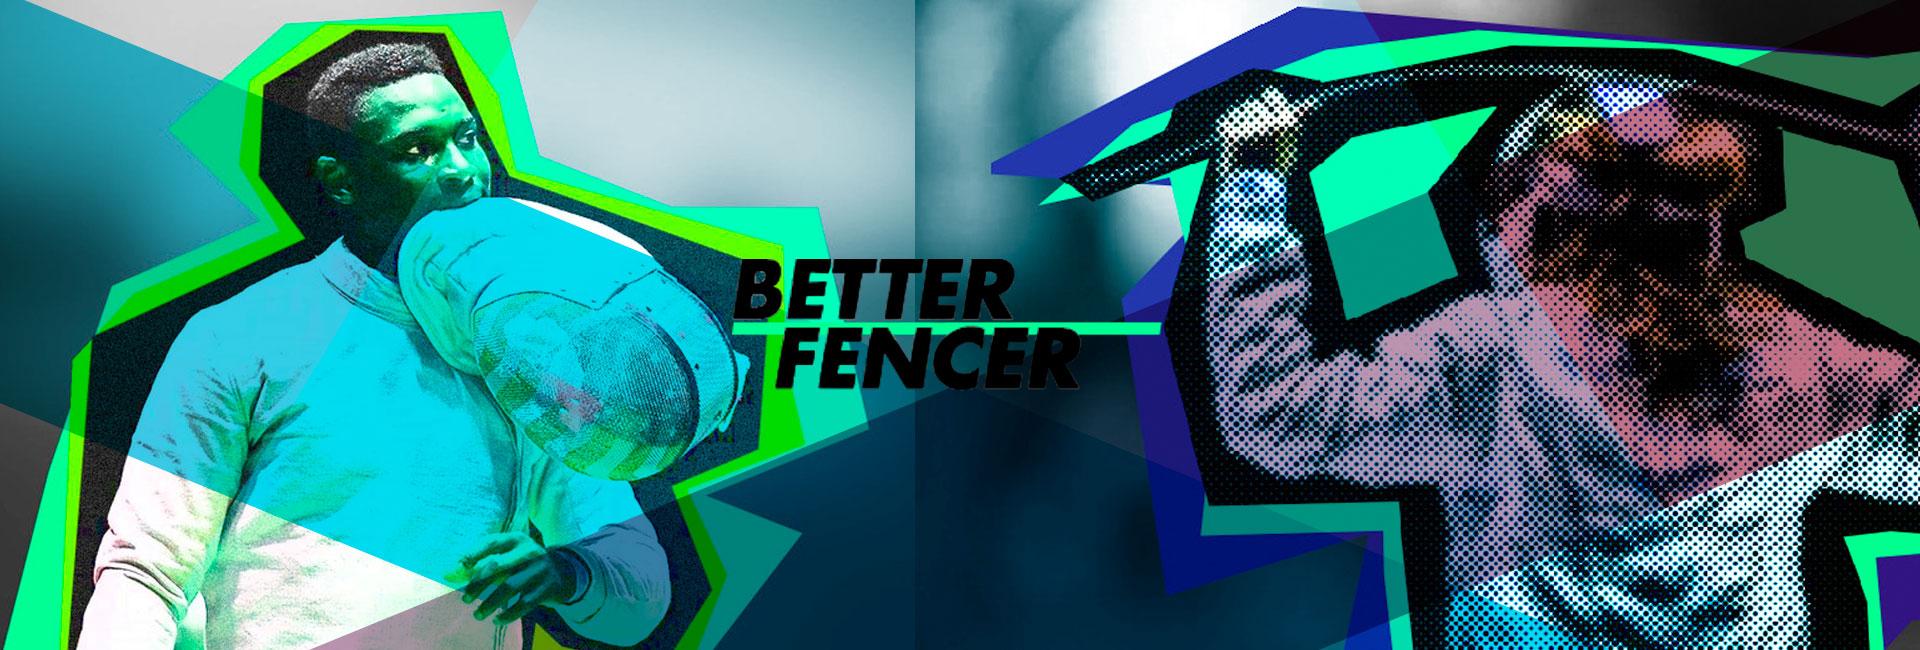 Entrevista de esgrima a Better Fencer